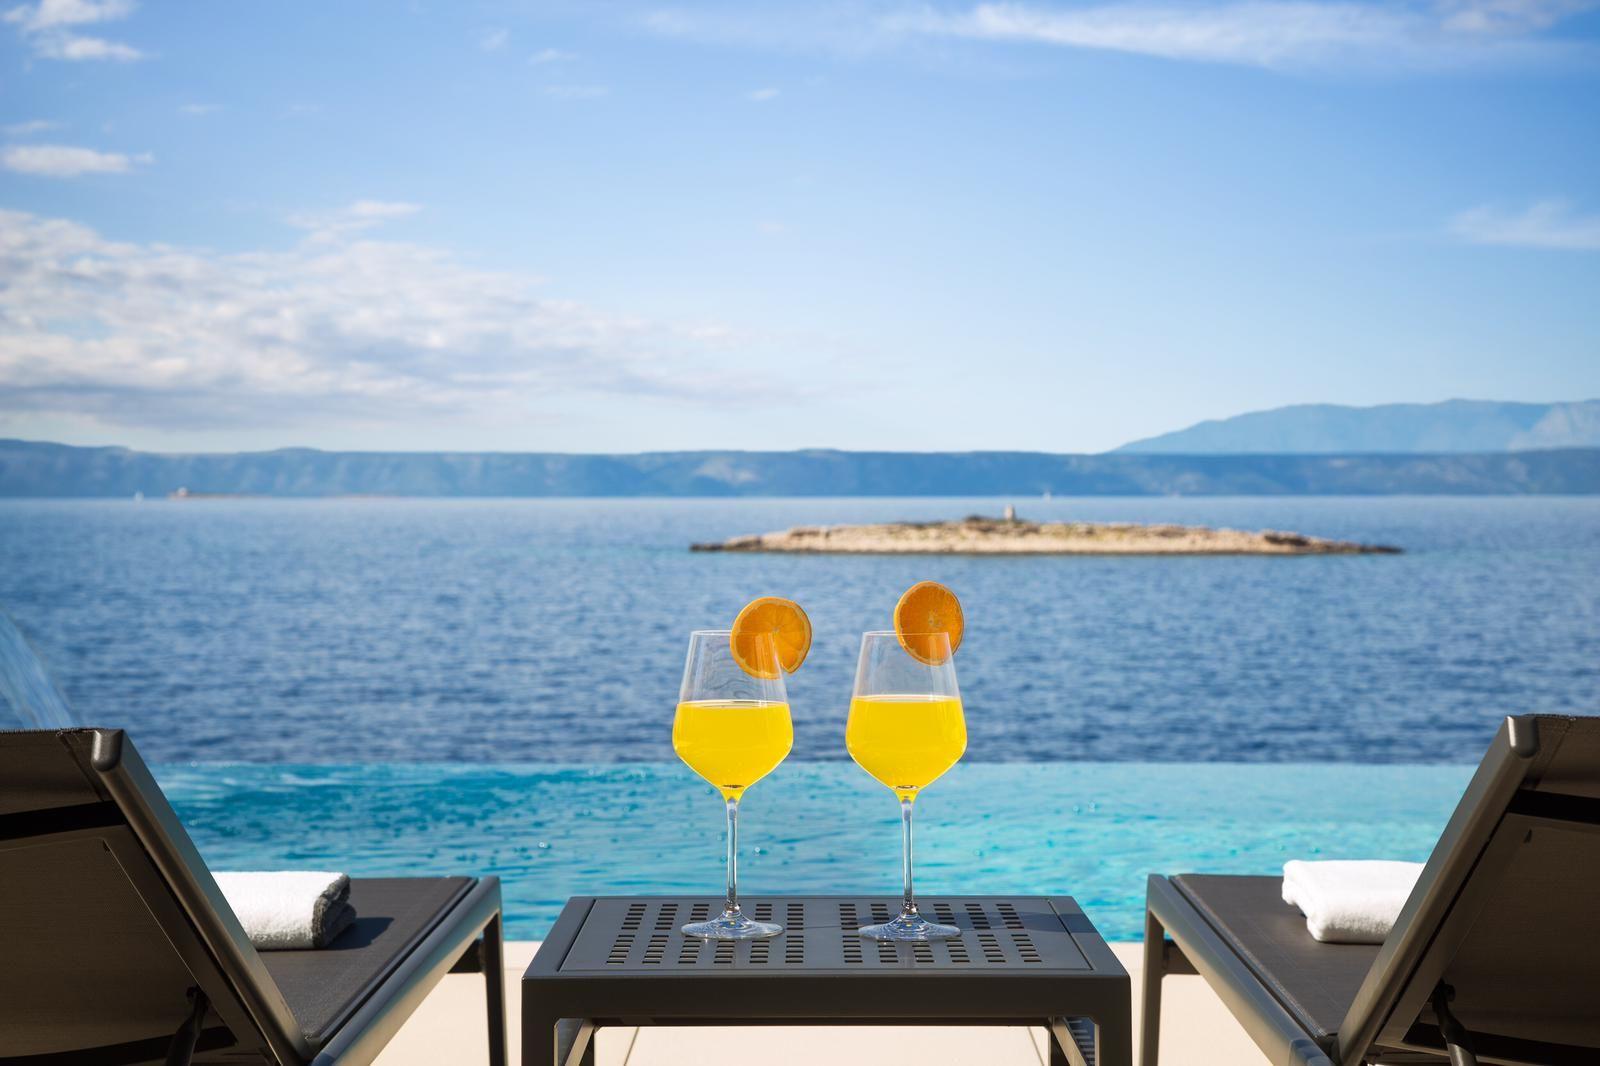 View from the Luxury Villa Palma de Korkyra Pool on Korcula Island